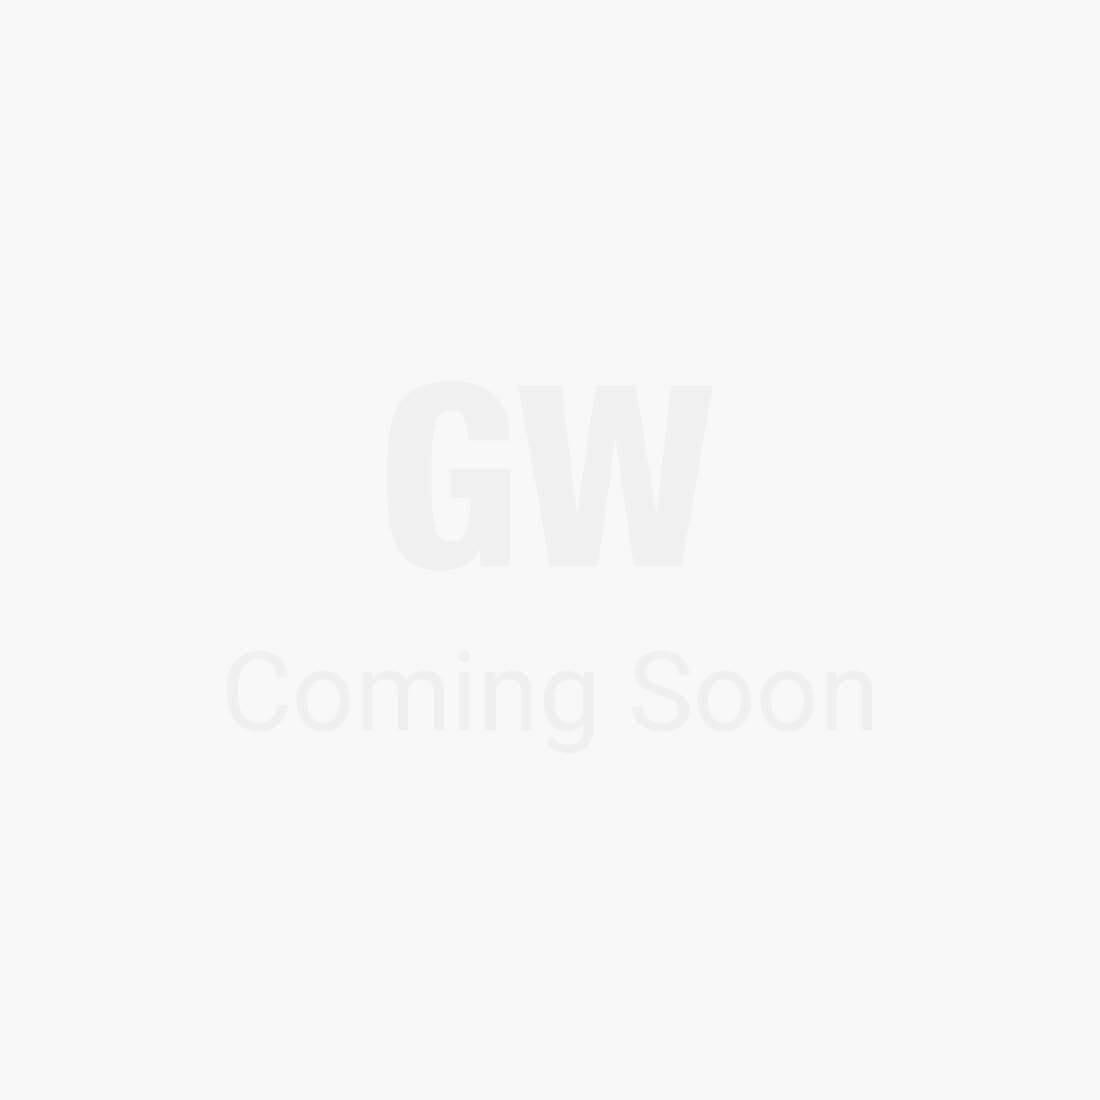 Vittoria Slip Cover 4 Seater Sofa, Slip Cover Sofas